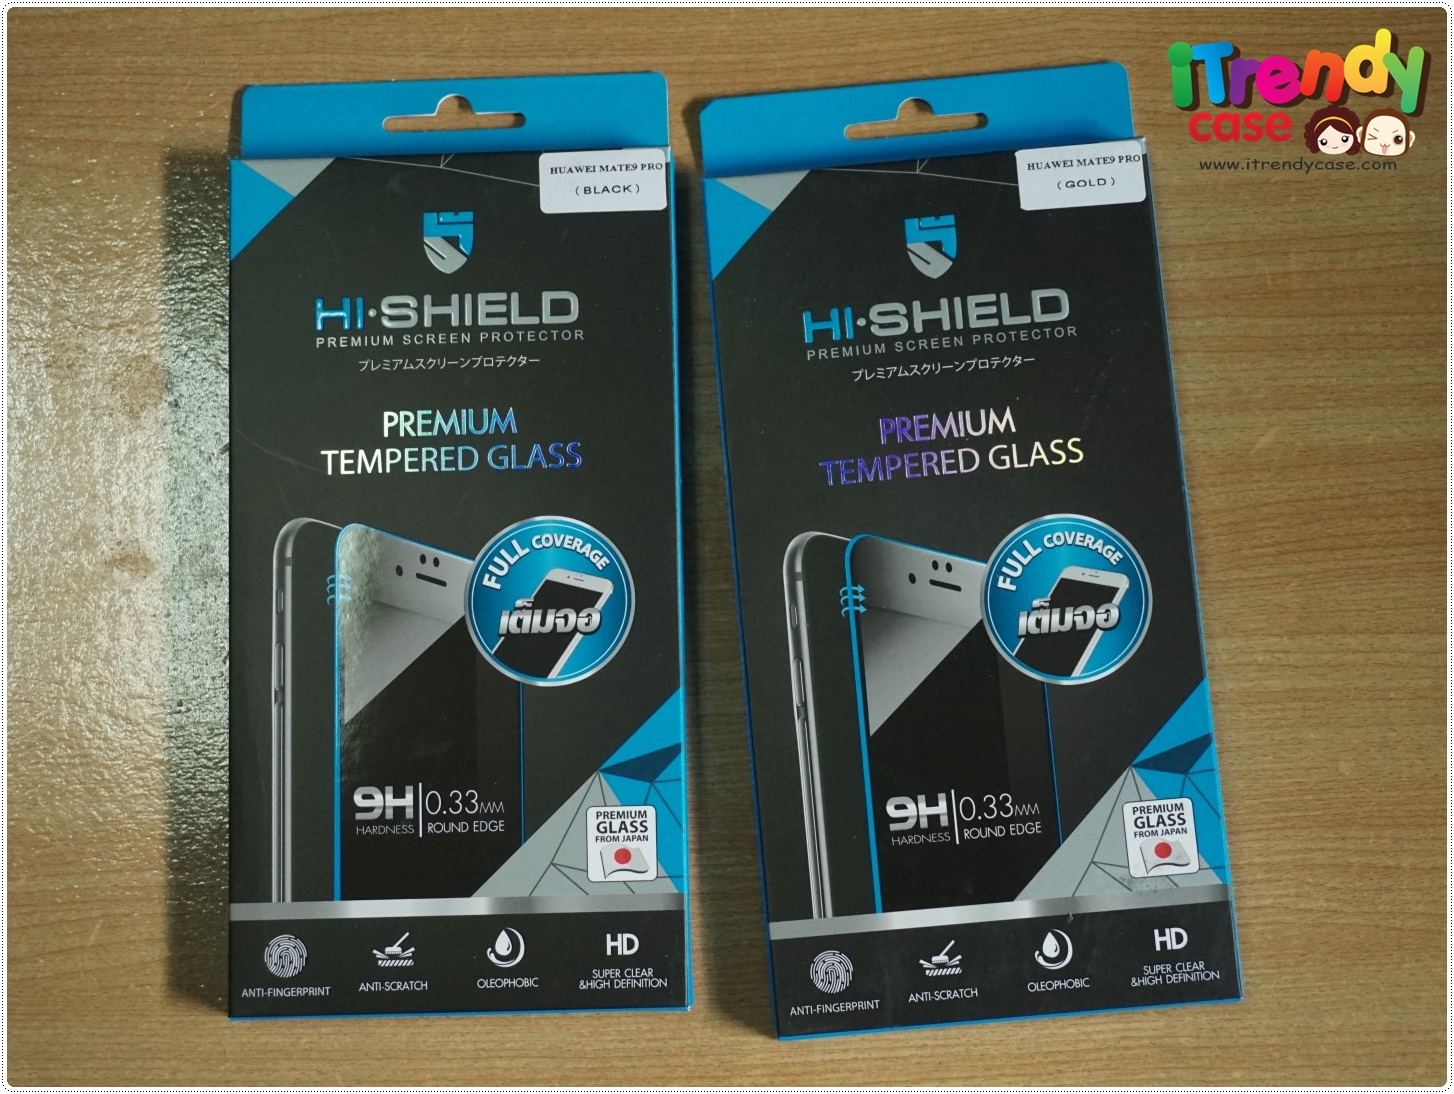 Huawei Mate9 Pro (เต็มจอ/3D) - กระจกนิรภัย Hi-Shield Premium Tempered Glass 9H 0.33mm แท้